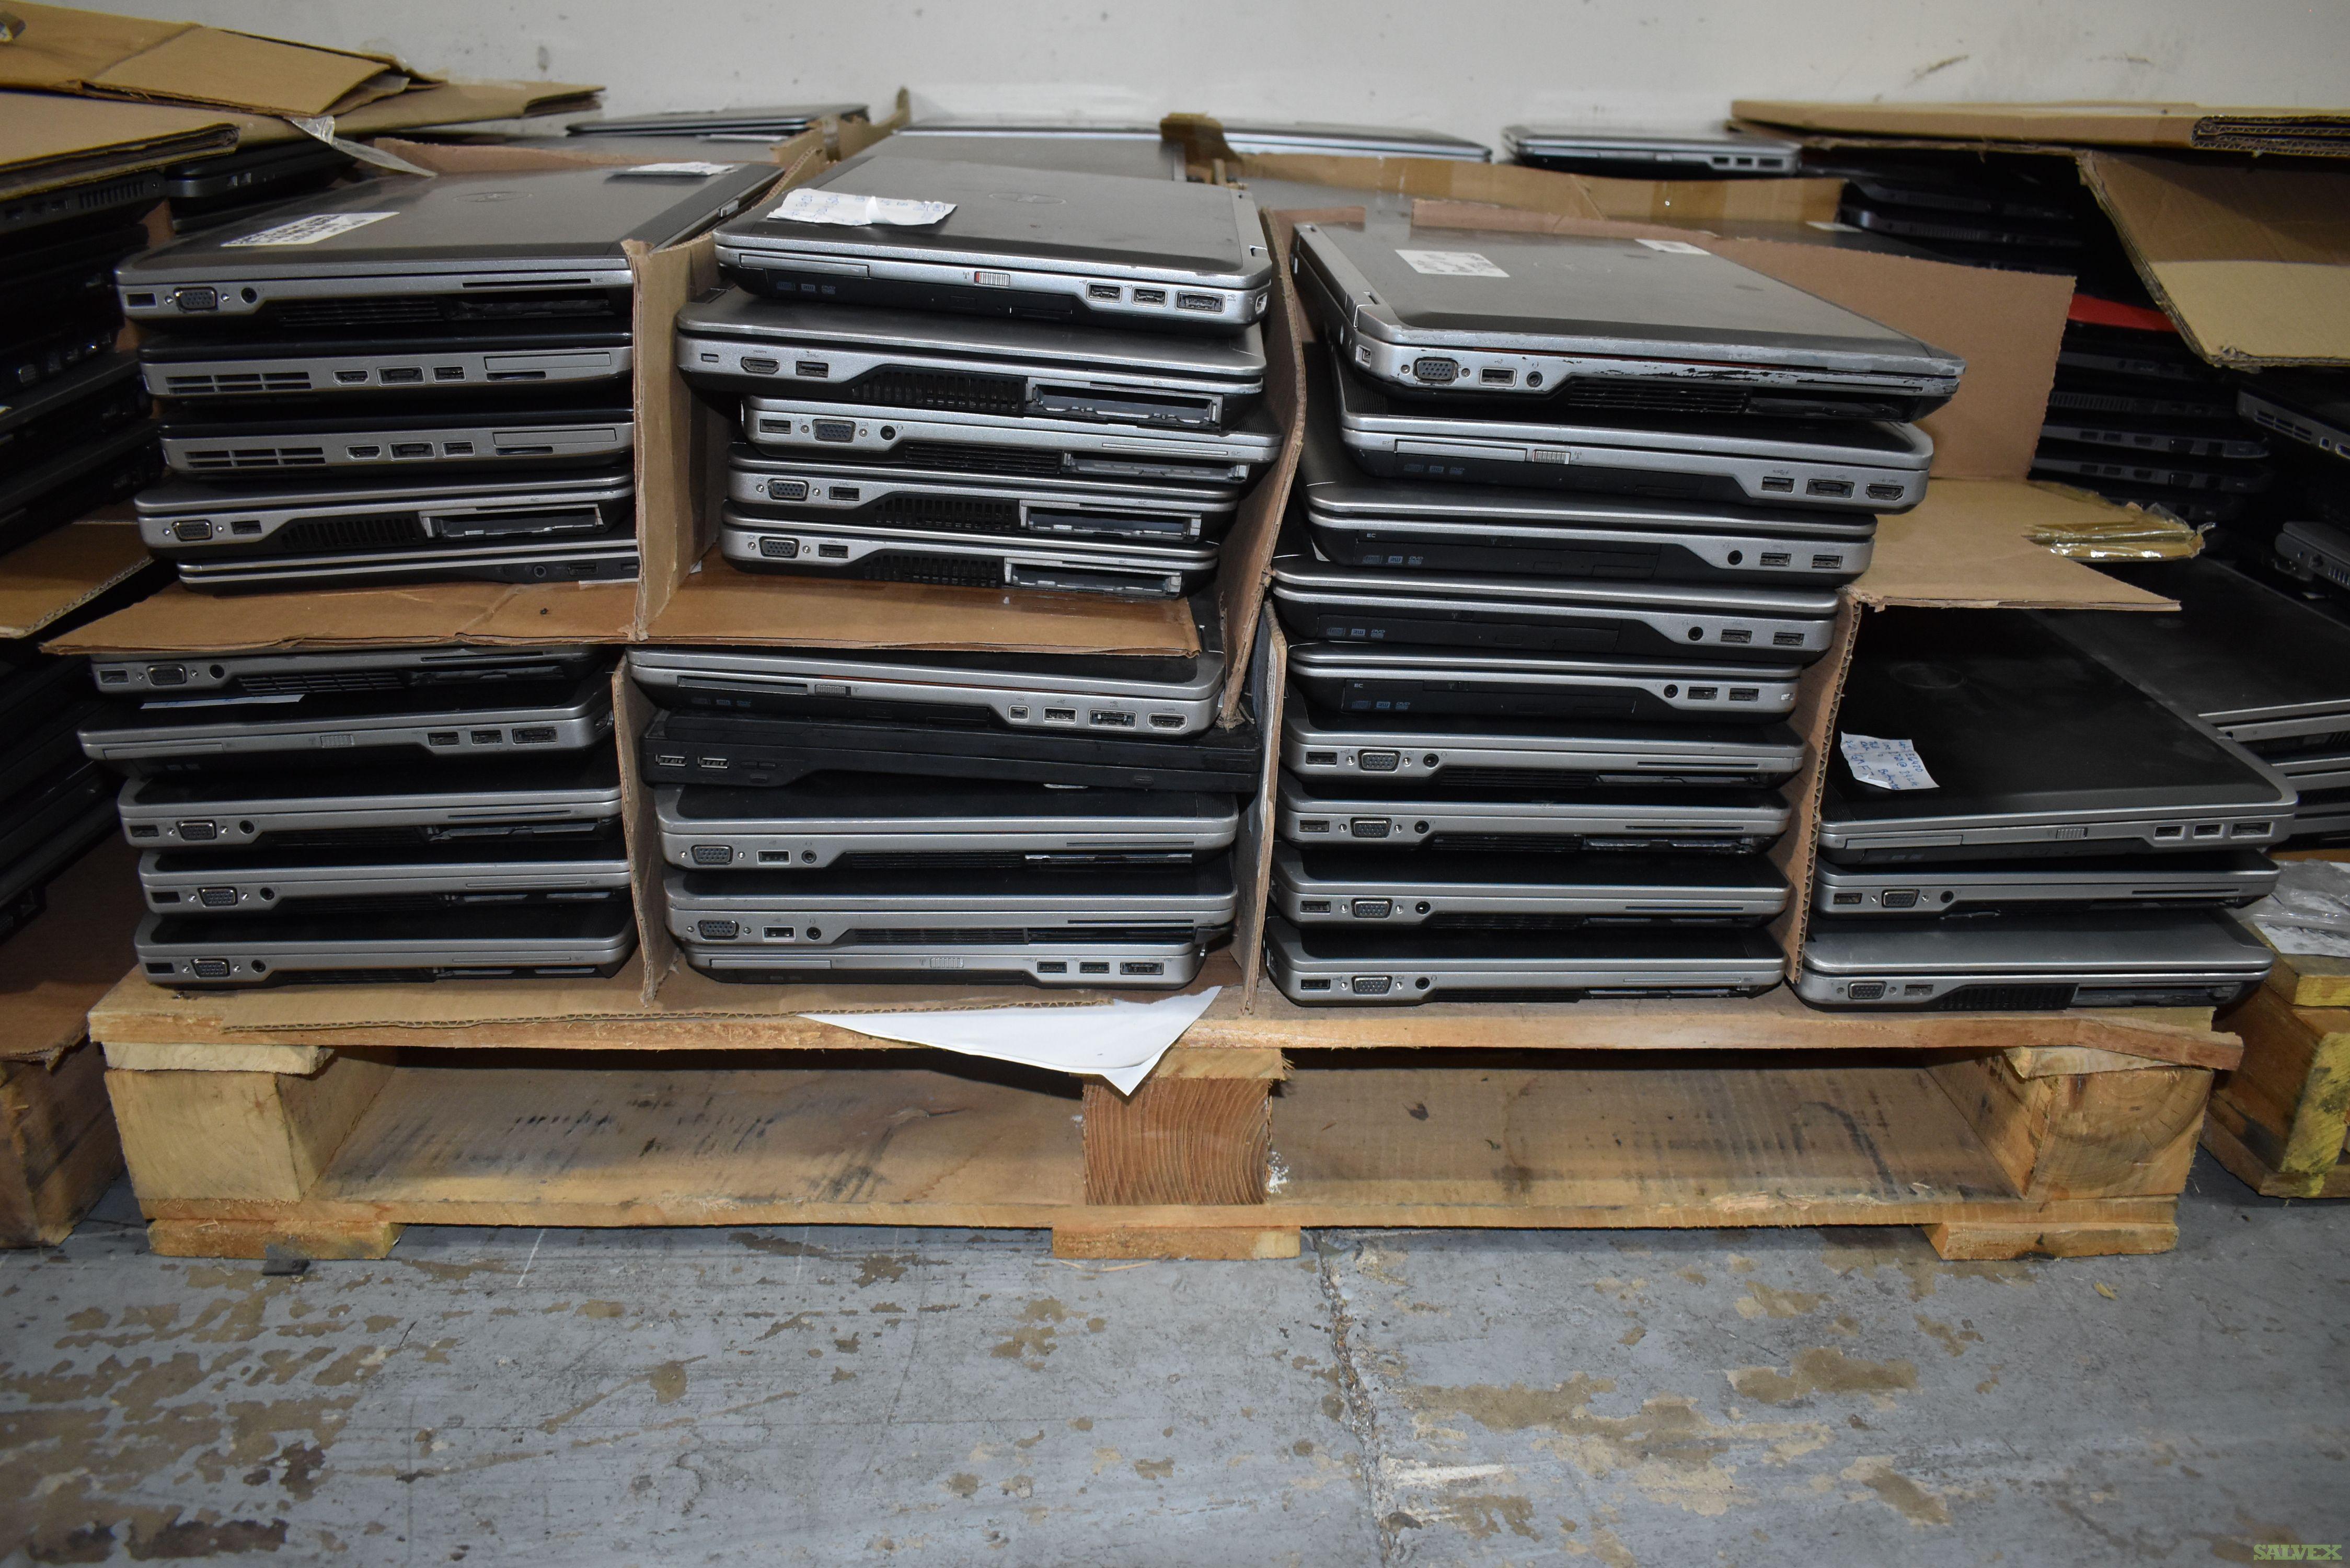 HP Laptops & Dell Latitude Laptops (332 Units)